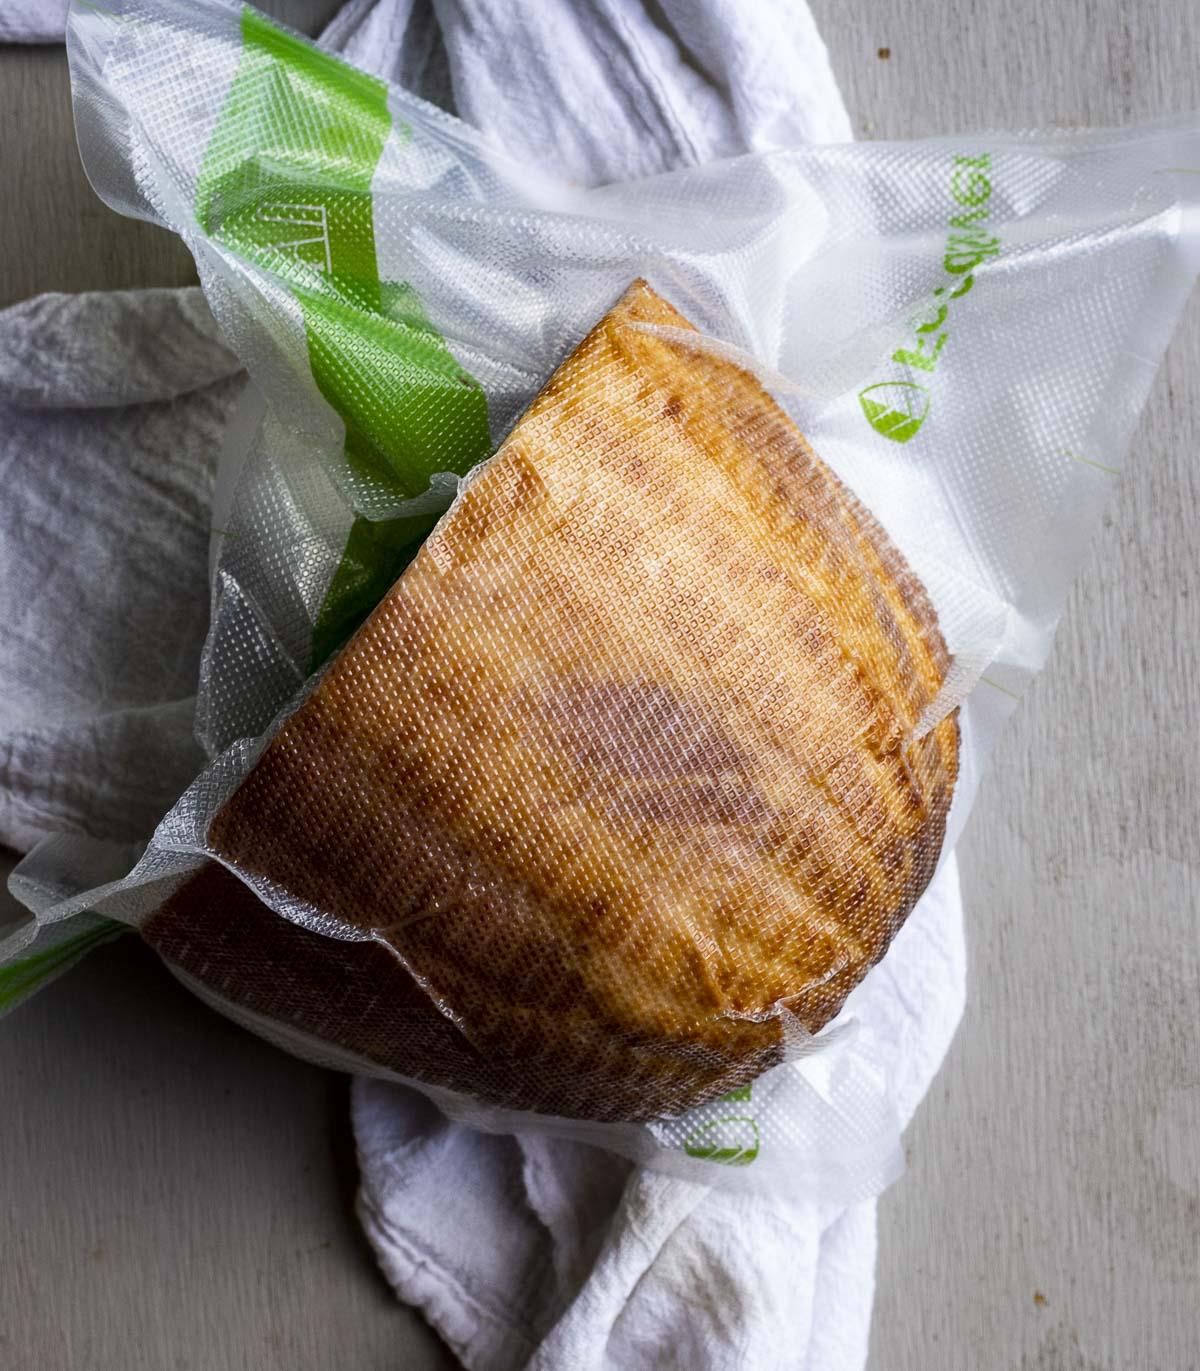 Boneless ham vacuumed sealed in a bag.